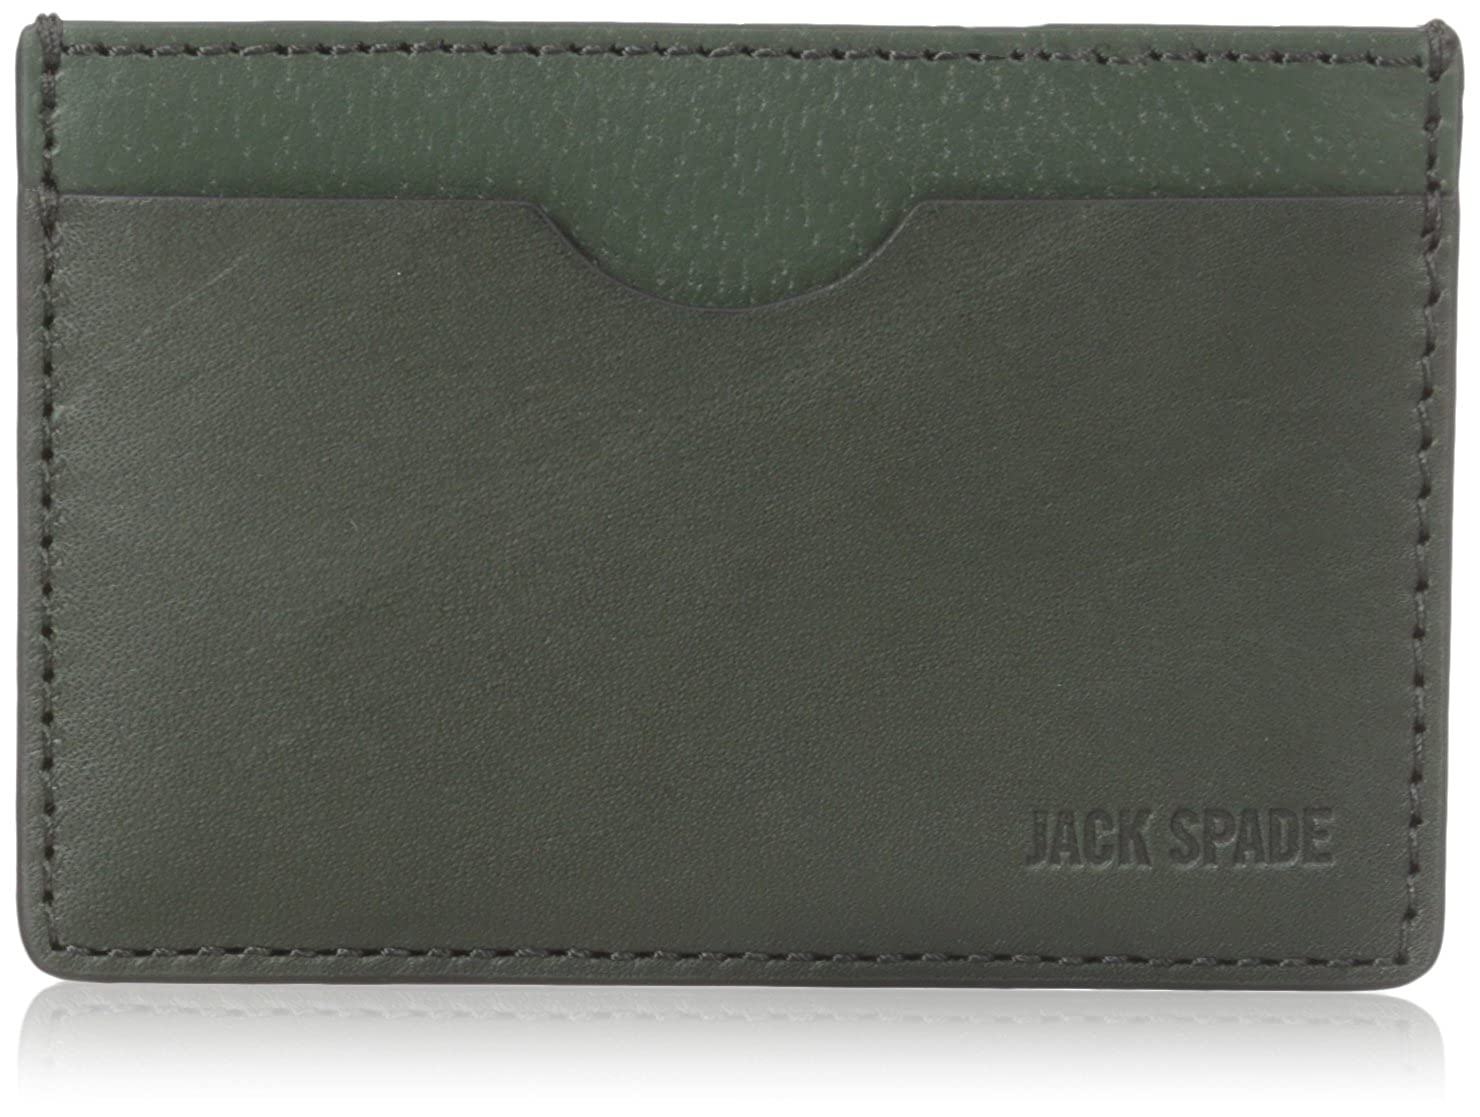 Amazon.com: jack spade otorgar Piel titular de la tarjeta de ...